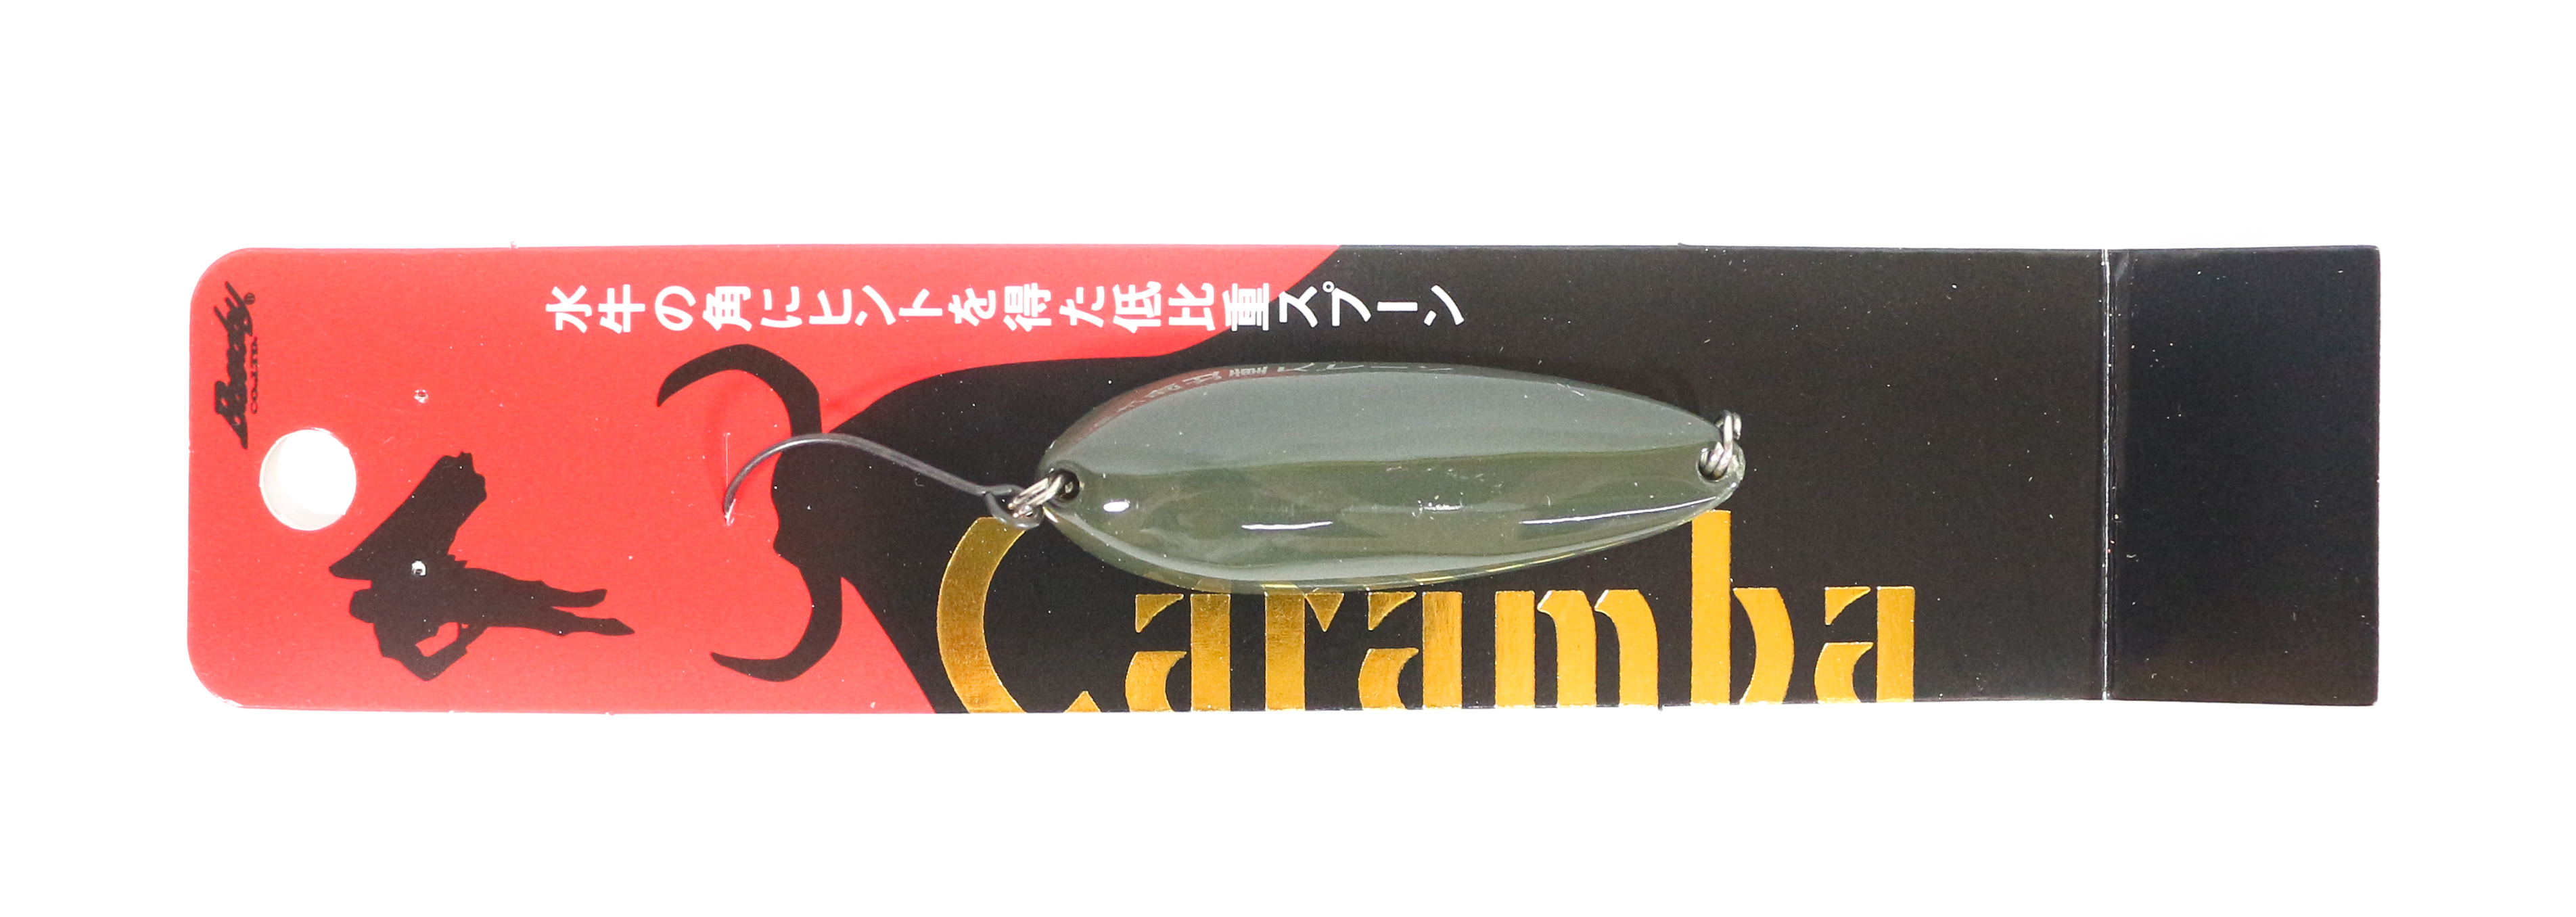 Sale Bassday Caramba 50 Spoon 3 grams 110 (3100)